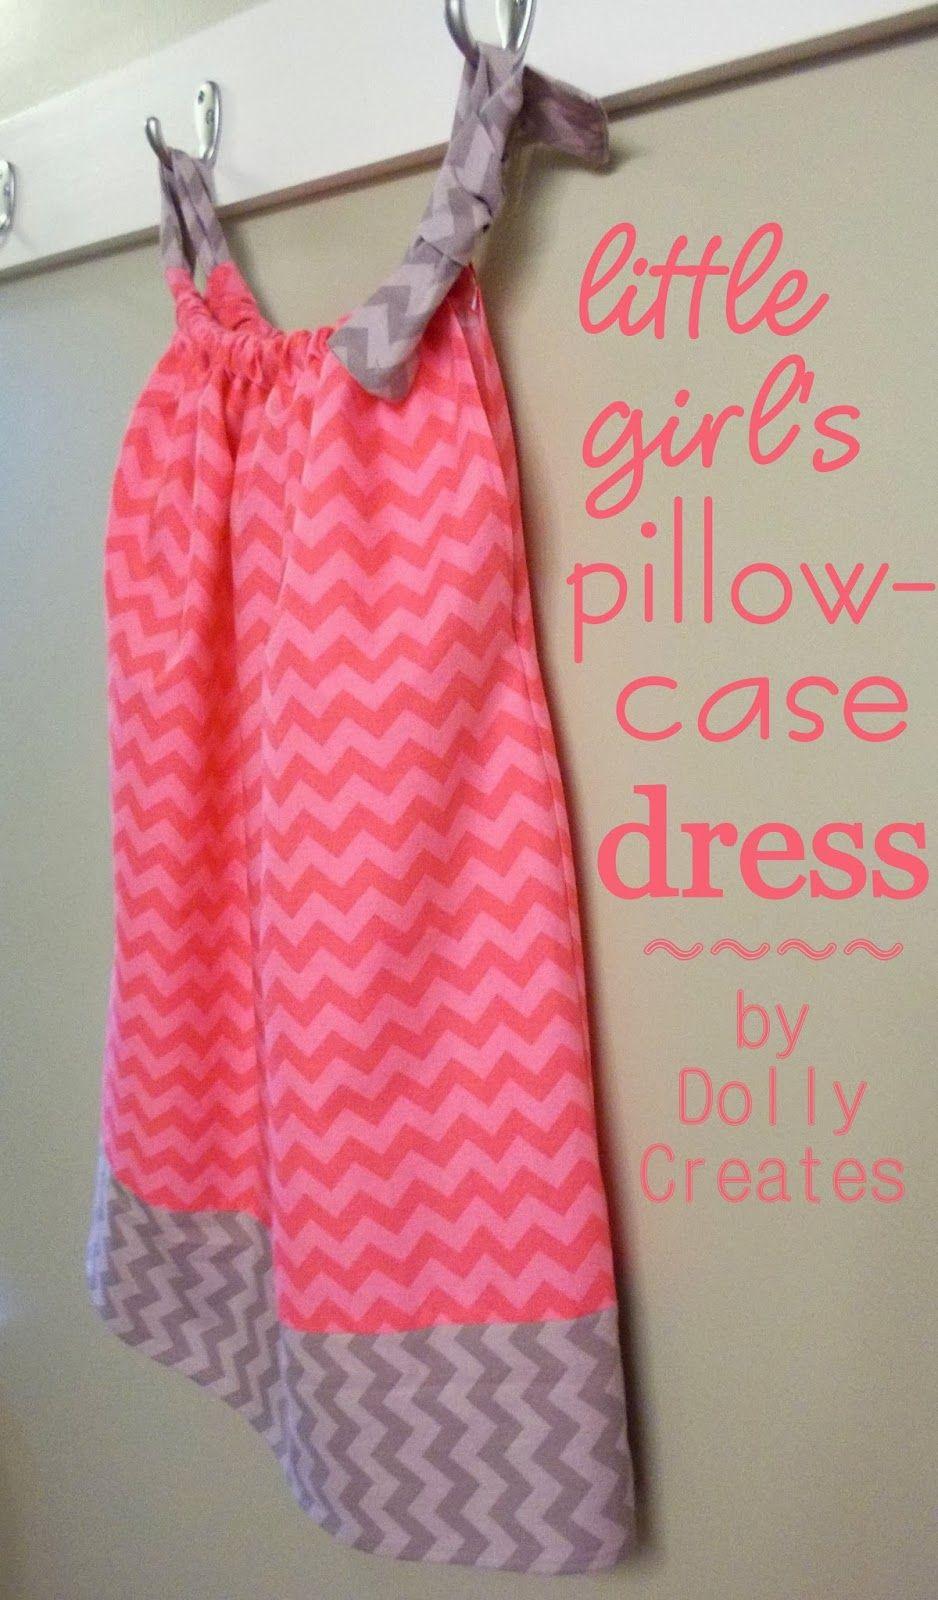 Dolly Creates: Little Girl\u0027s Pillowcase Dress & Dolly Creates: Little Girl\u0027s Pillowcase Dress | Sewing for Kids ... pillowsntoast.com